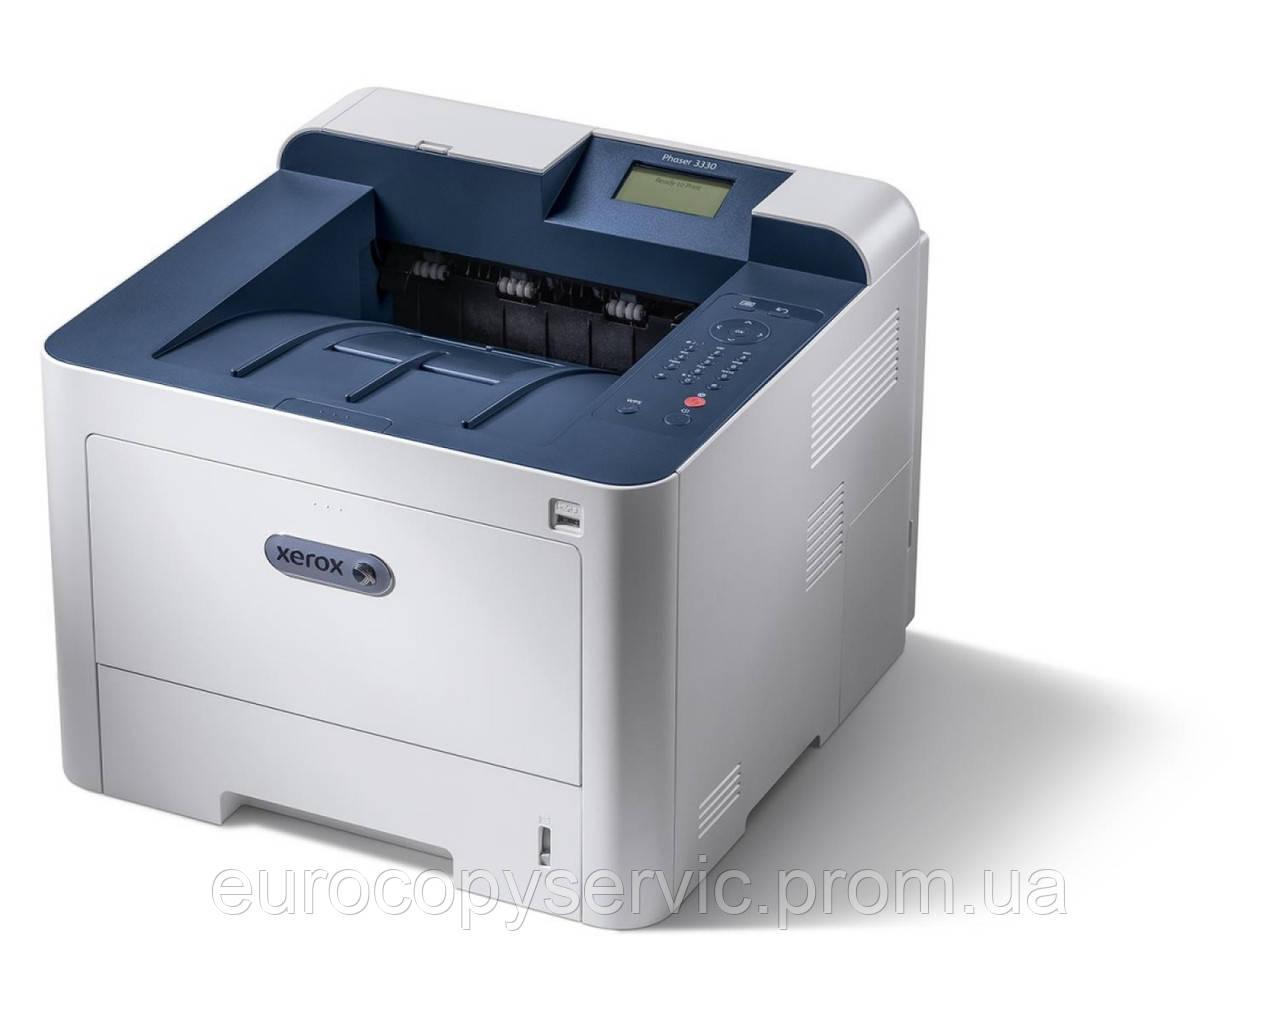 Принтер А4 Xerox Phaser 3330DNI (3330V_DNI) з Wi-Fi